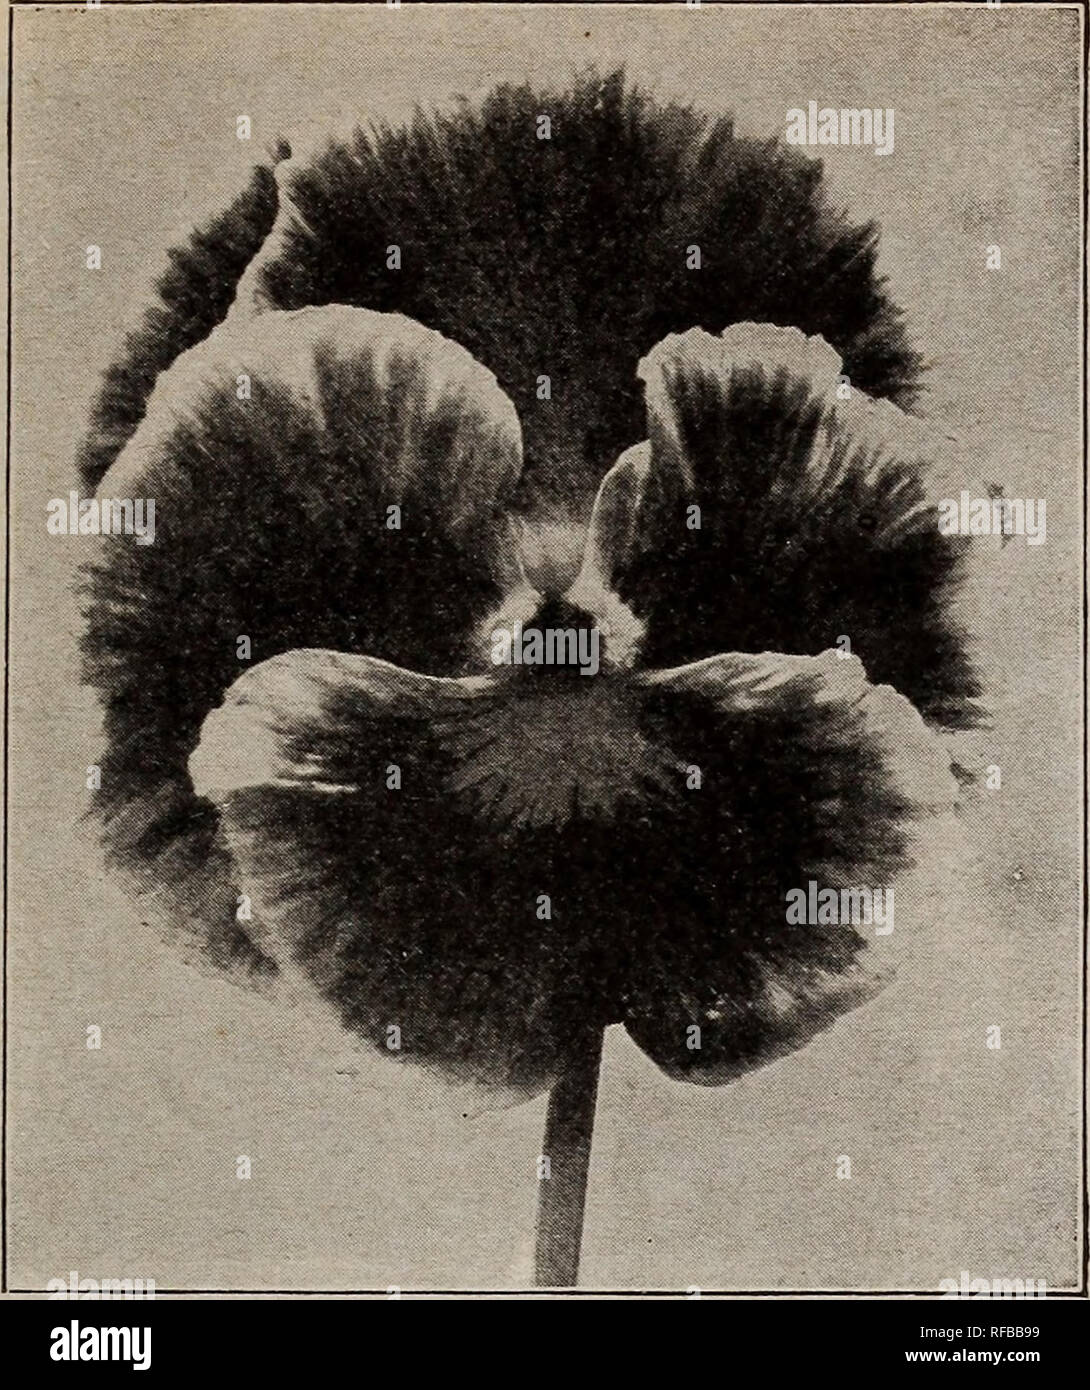 Catalogue 1915 Seeds Bulbs Shrubs Seeds Catalogs Vegetables